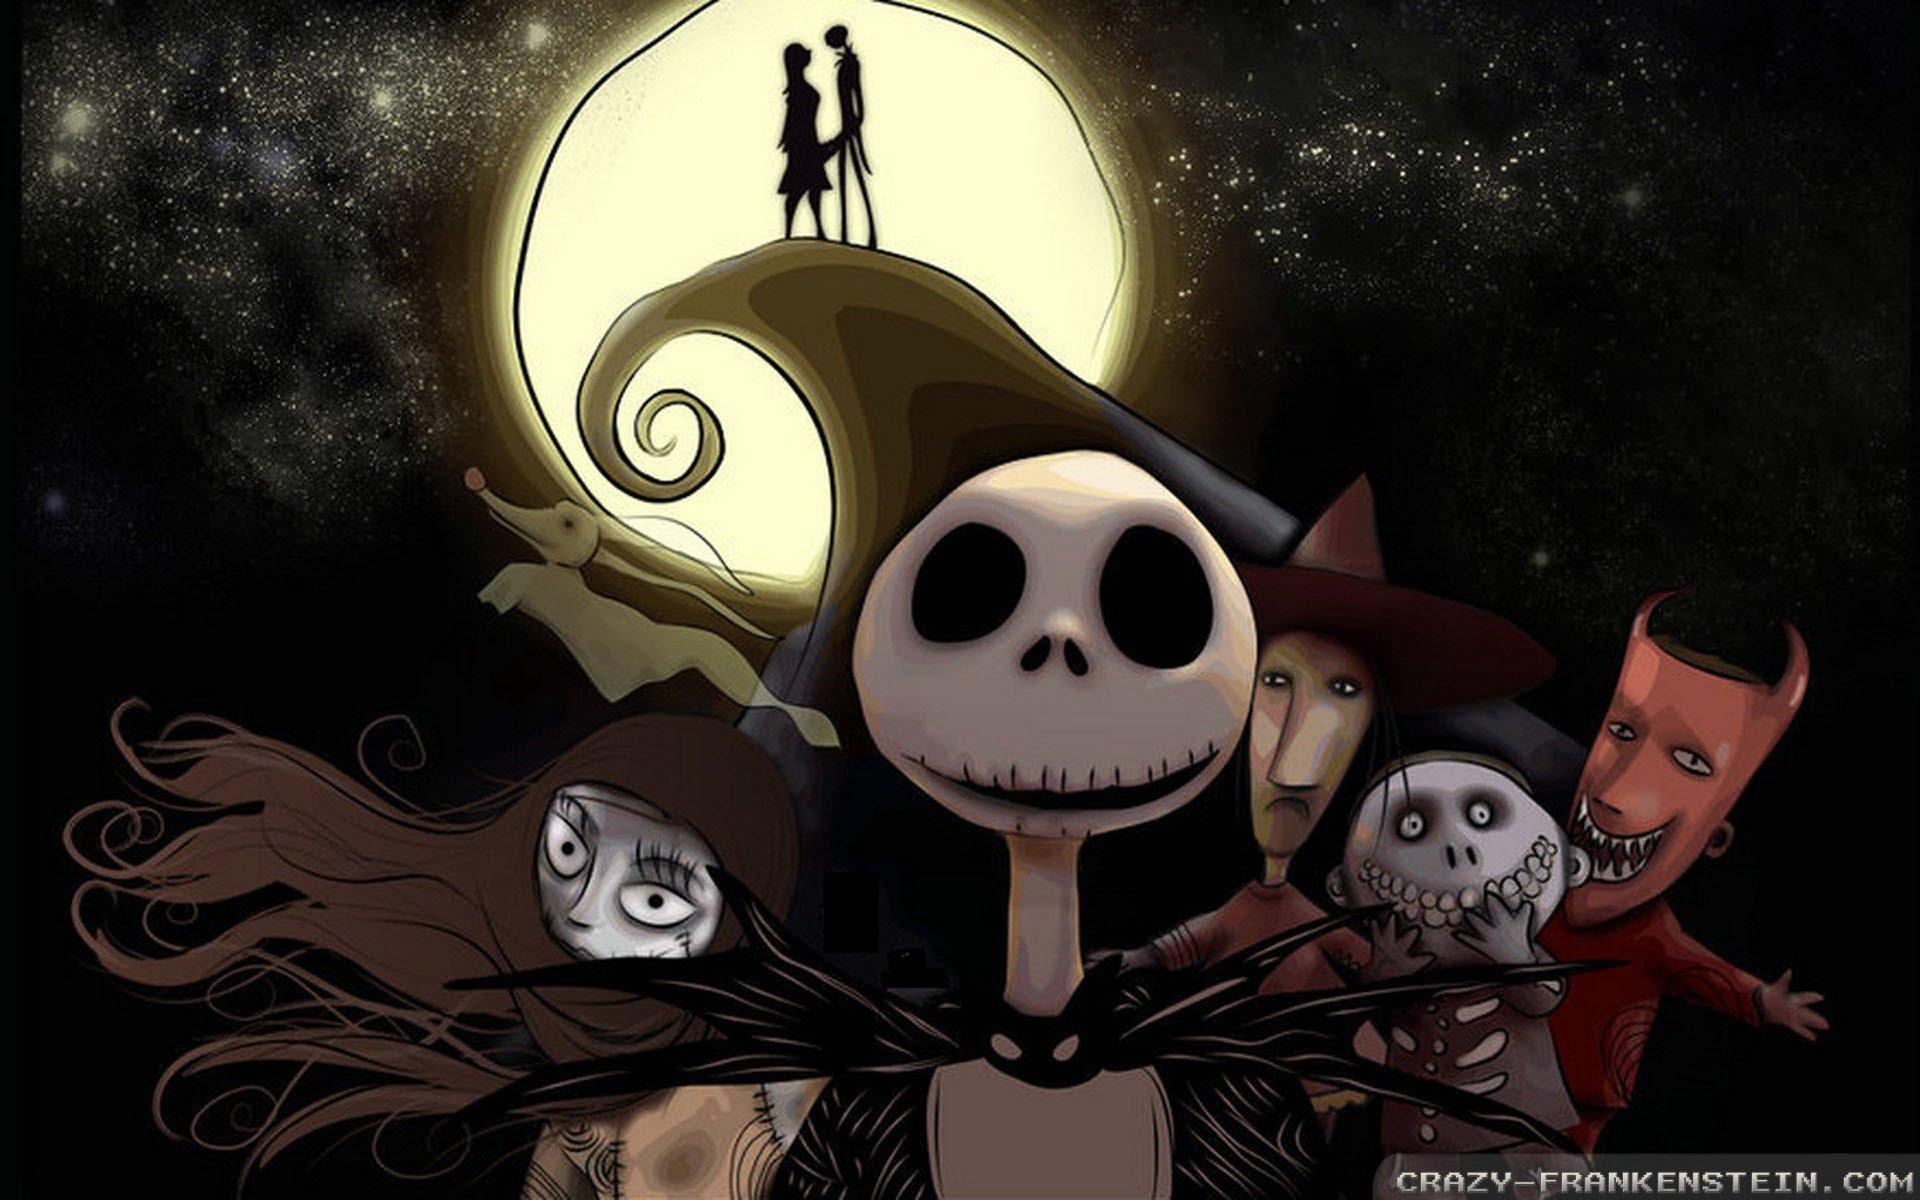 This Is Halloween Nightmare Before Christmas Wallpaper 39989073